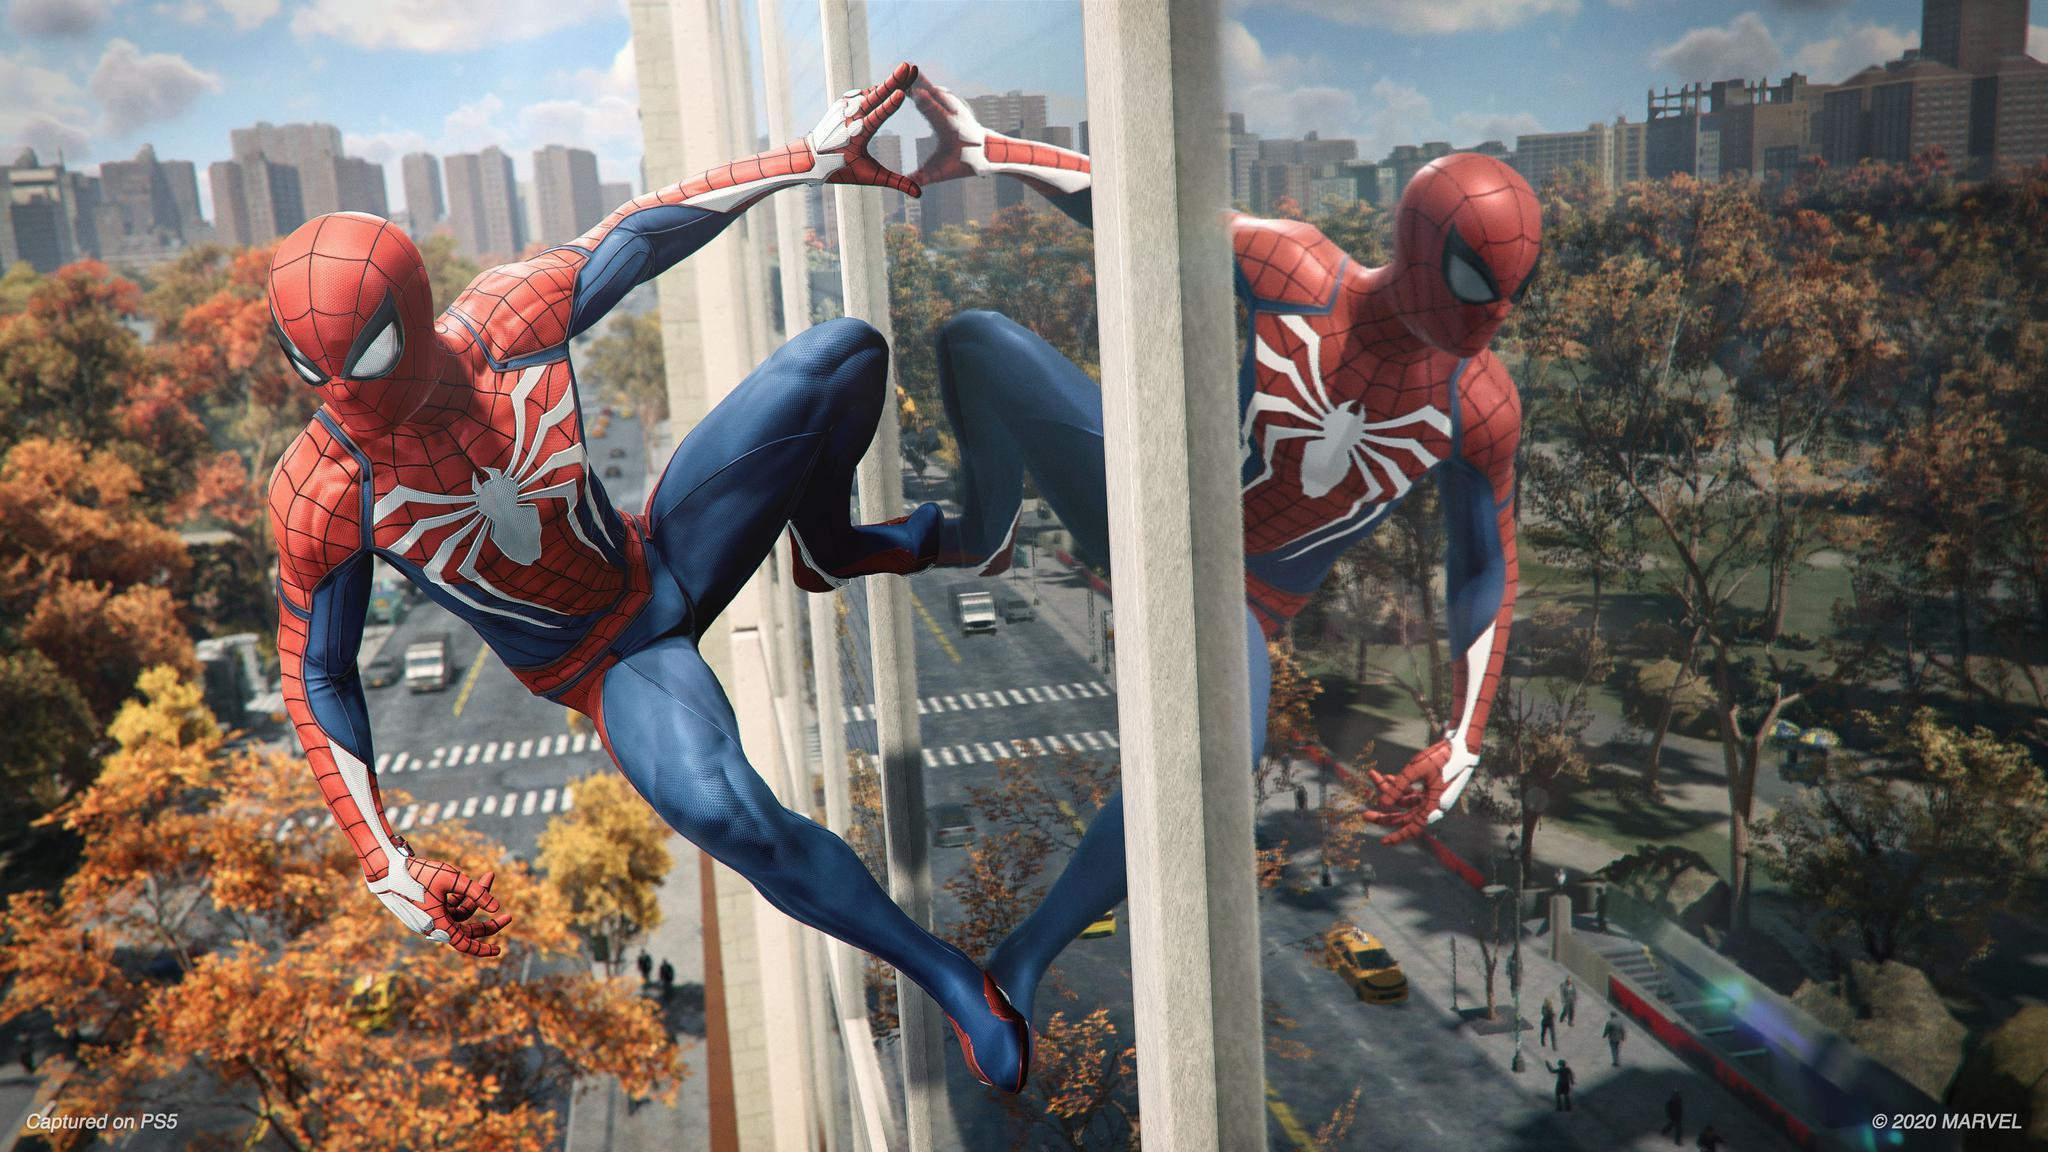 PS5《蜘蛛侠 Remastered》游戏截图,本作将在11月12日推出。